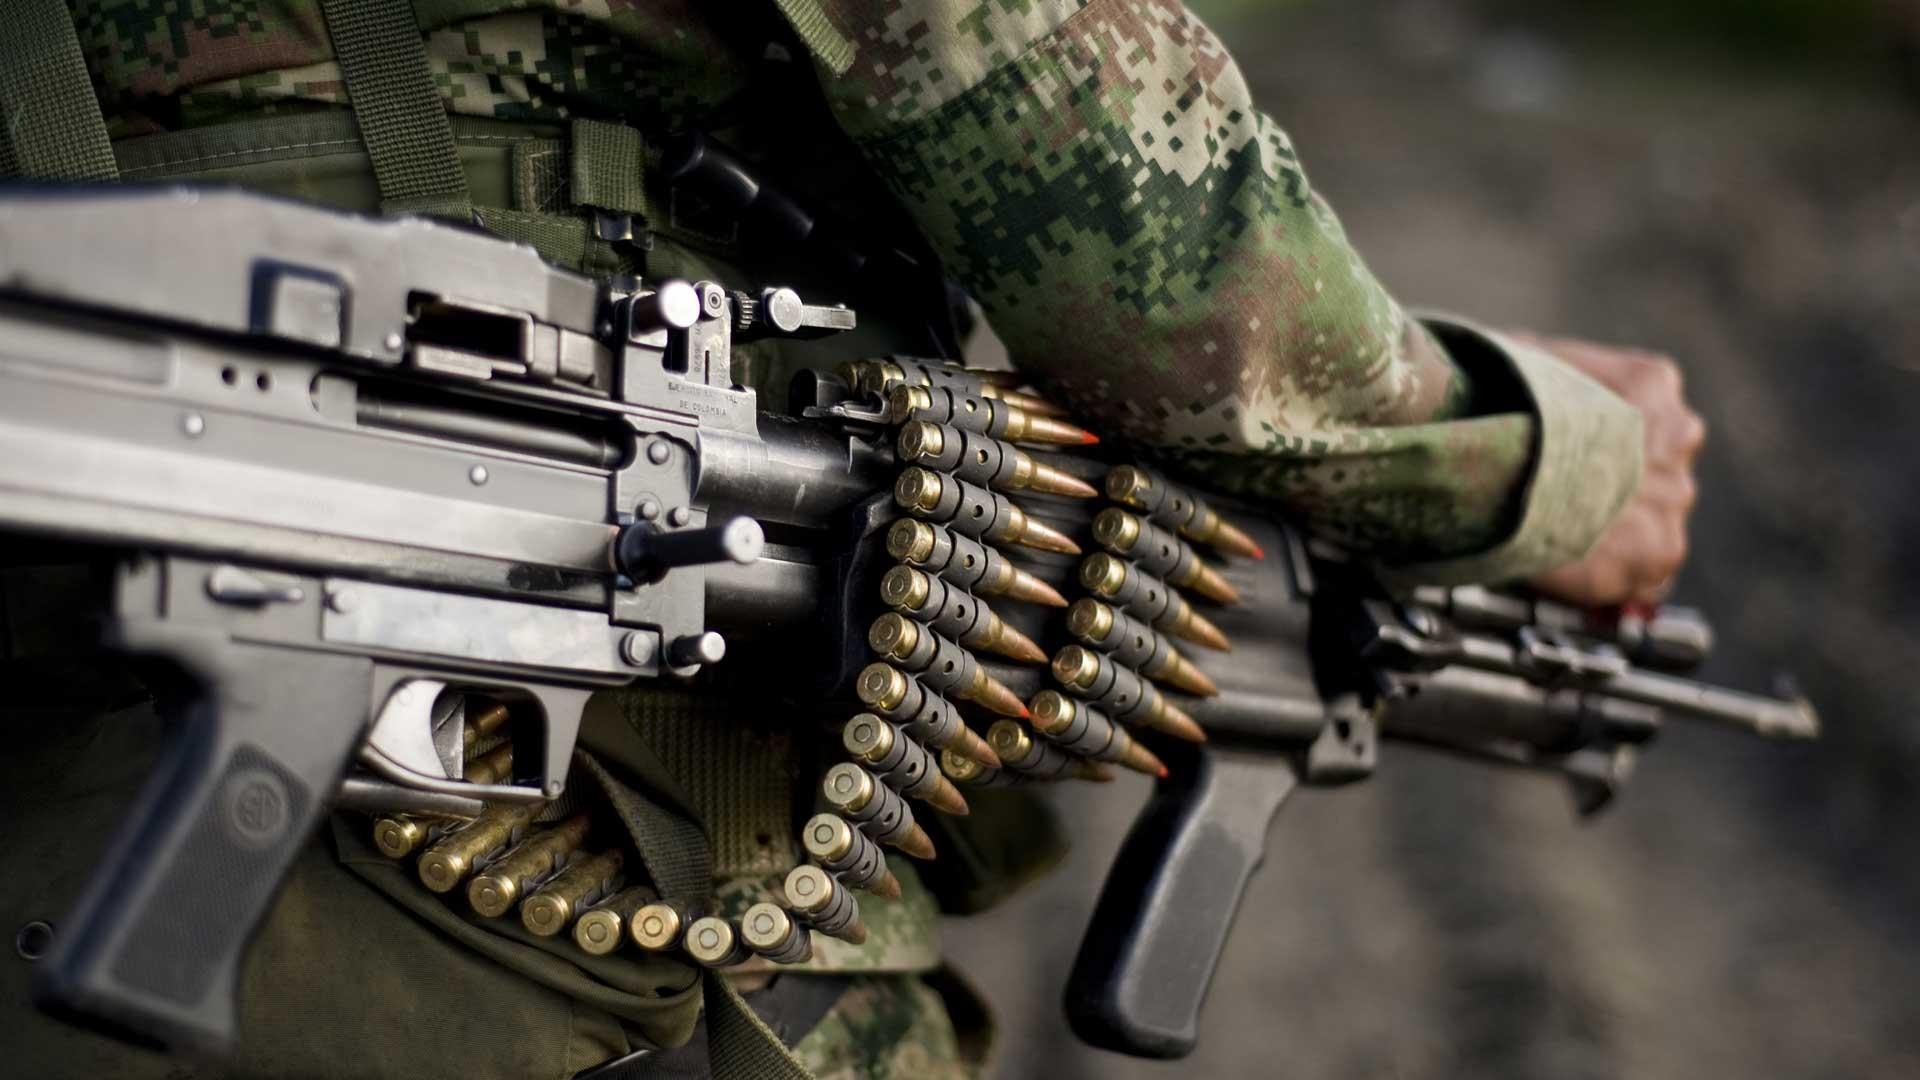 rifles soldiers machine gun guns military soldier Warfare 1920x1080